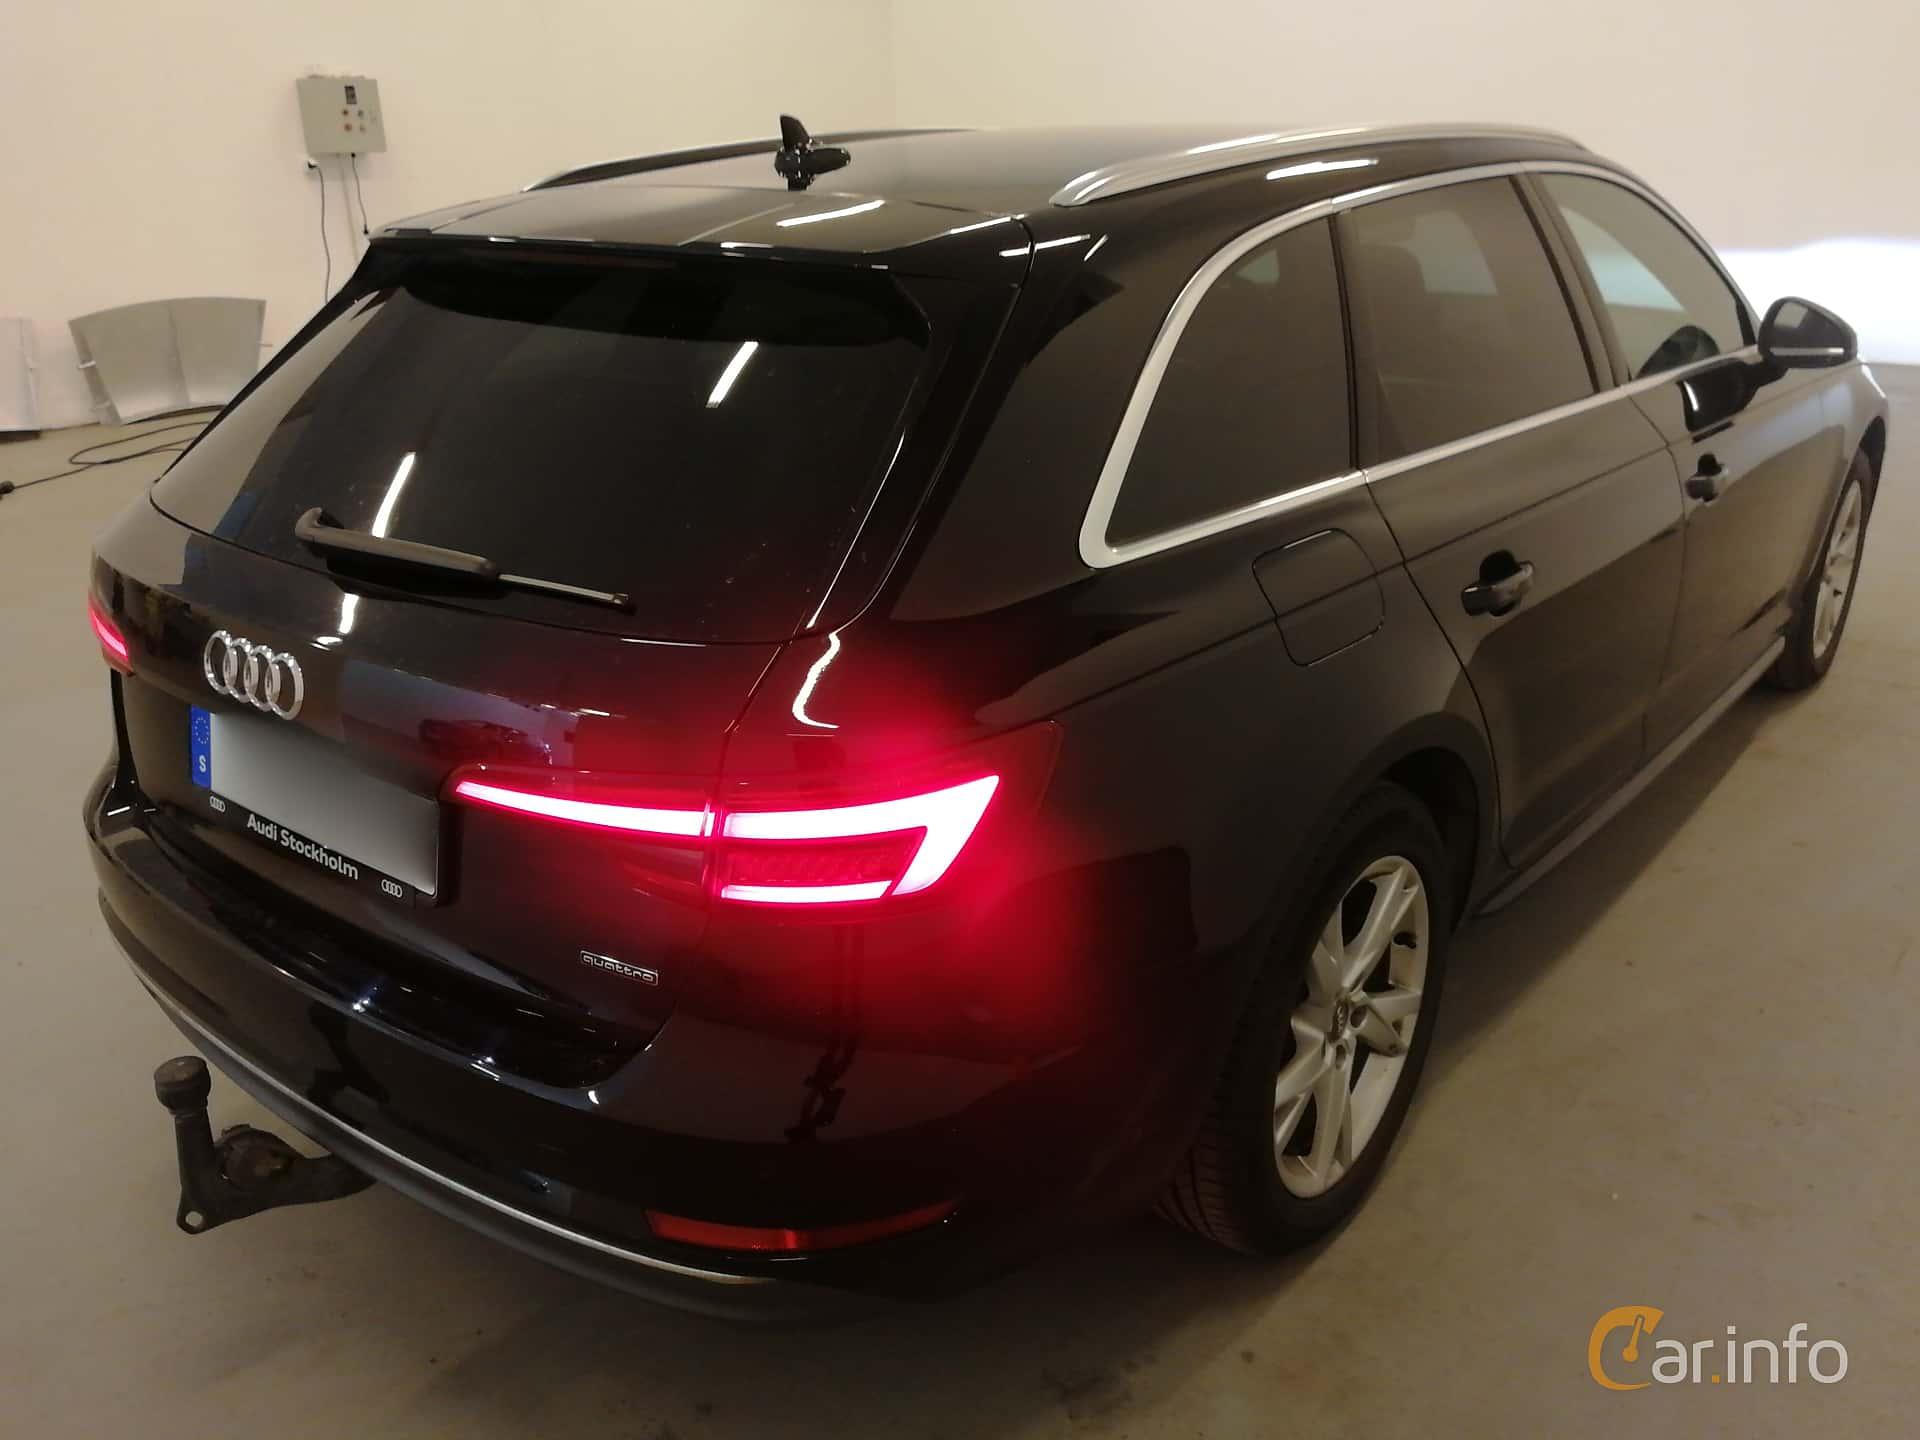 Audi A4 Avant 2.0 TDI quattro S Tronic, 190hp, 2018